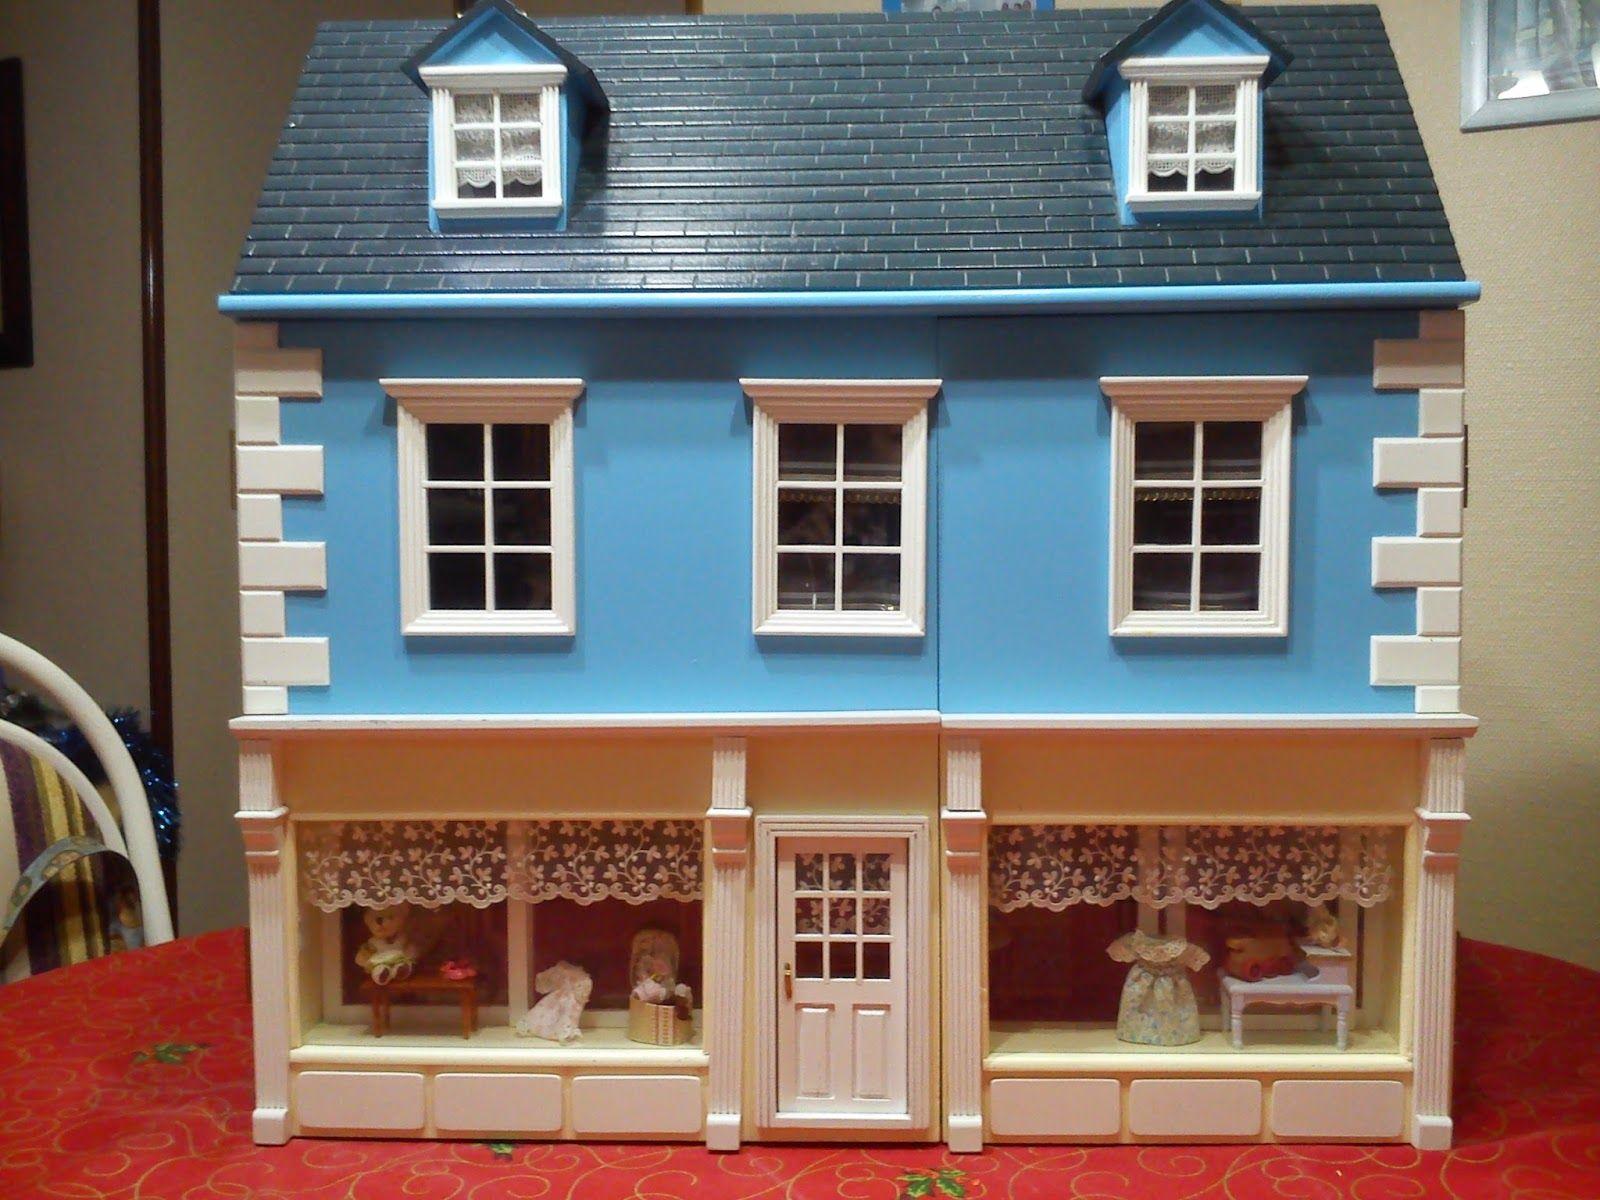 carmuchas artesania: CASA DE REBAJAS | mis miniaturas | Pinterest ...